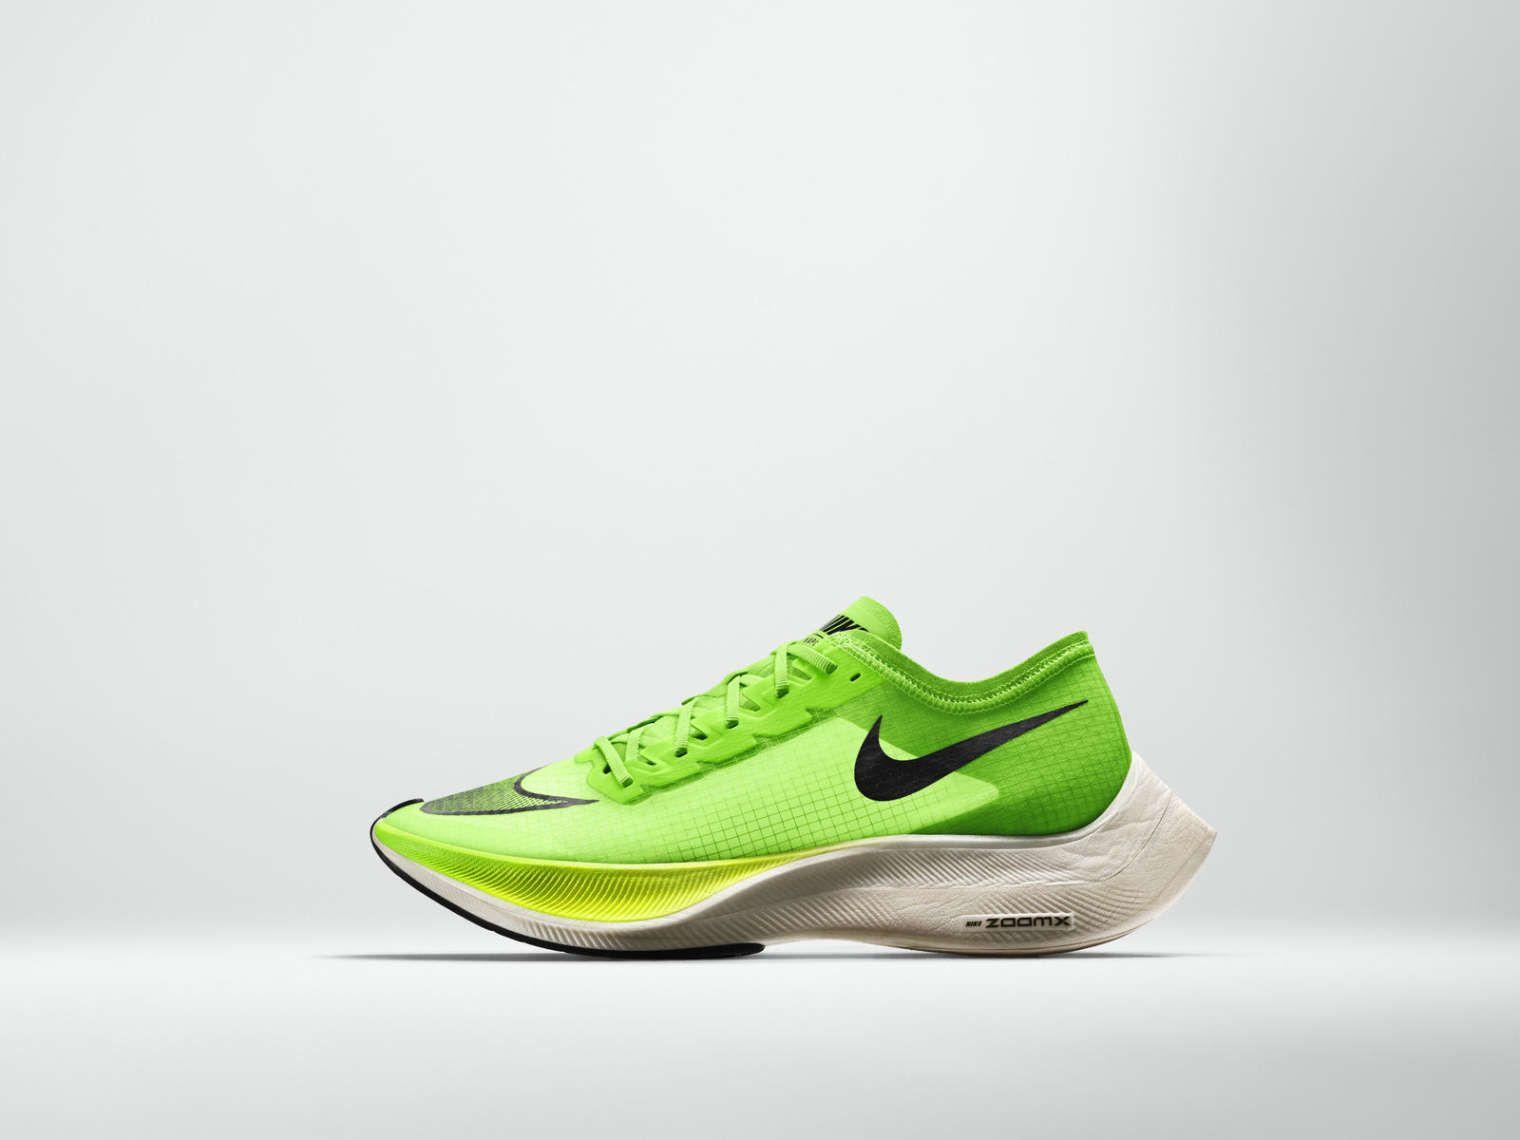 Nike Zoomx Vaporfly Next Eukicks Nike Mens Running Trainers Running Shoes